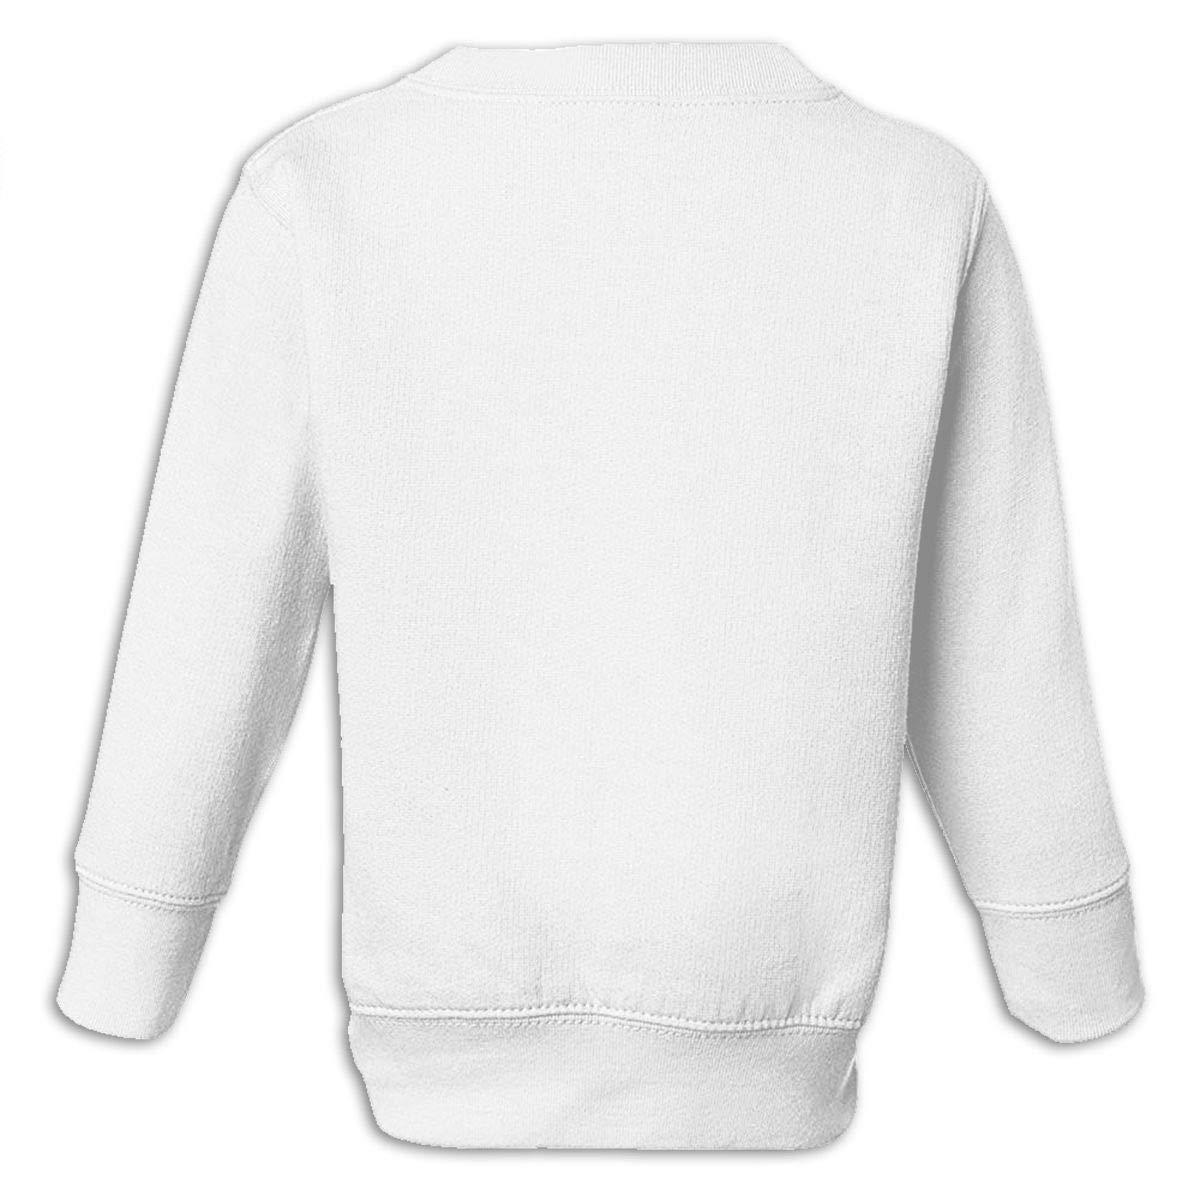 Eyes On The Prize Hamburger Baby Sweatshirt Cute Kids Hoodies Soft Sweaters